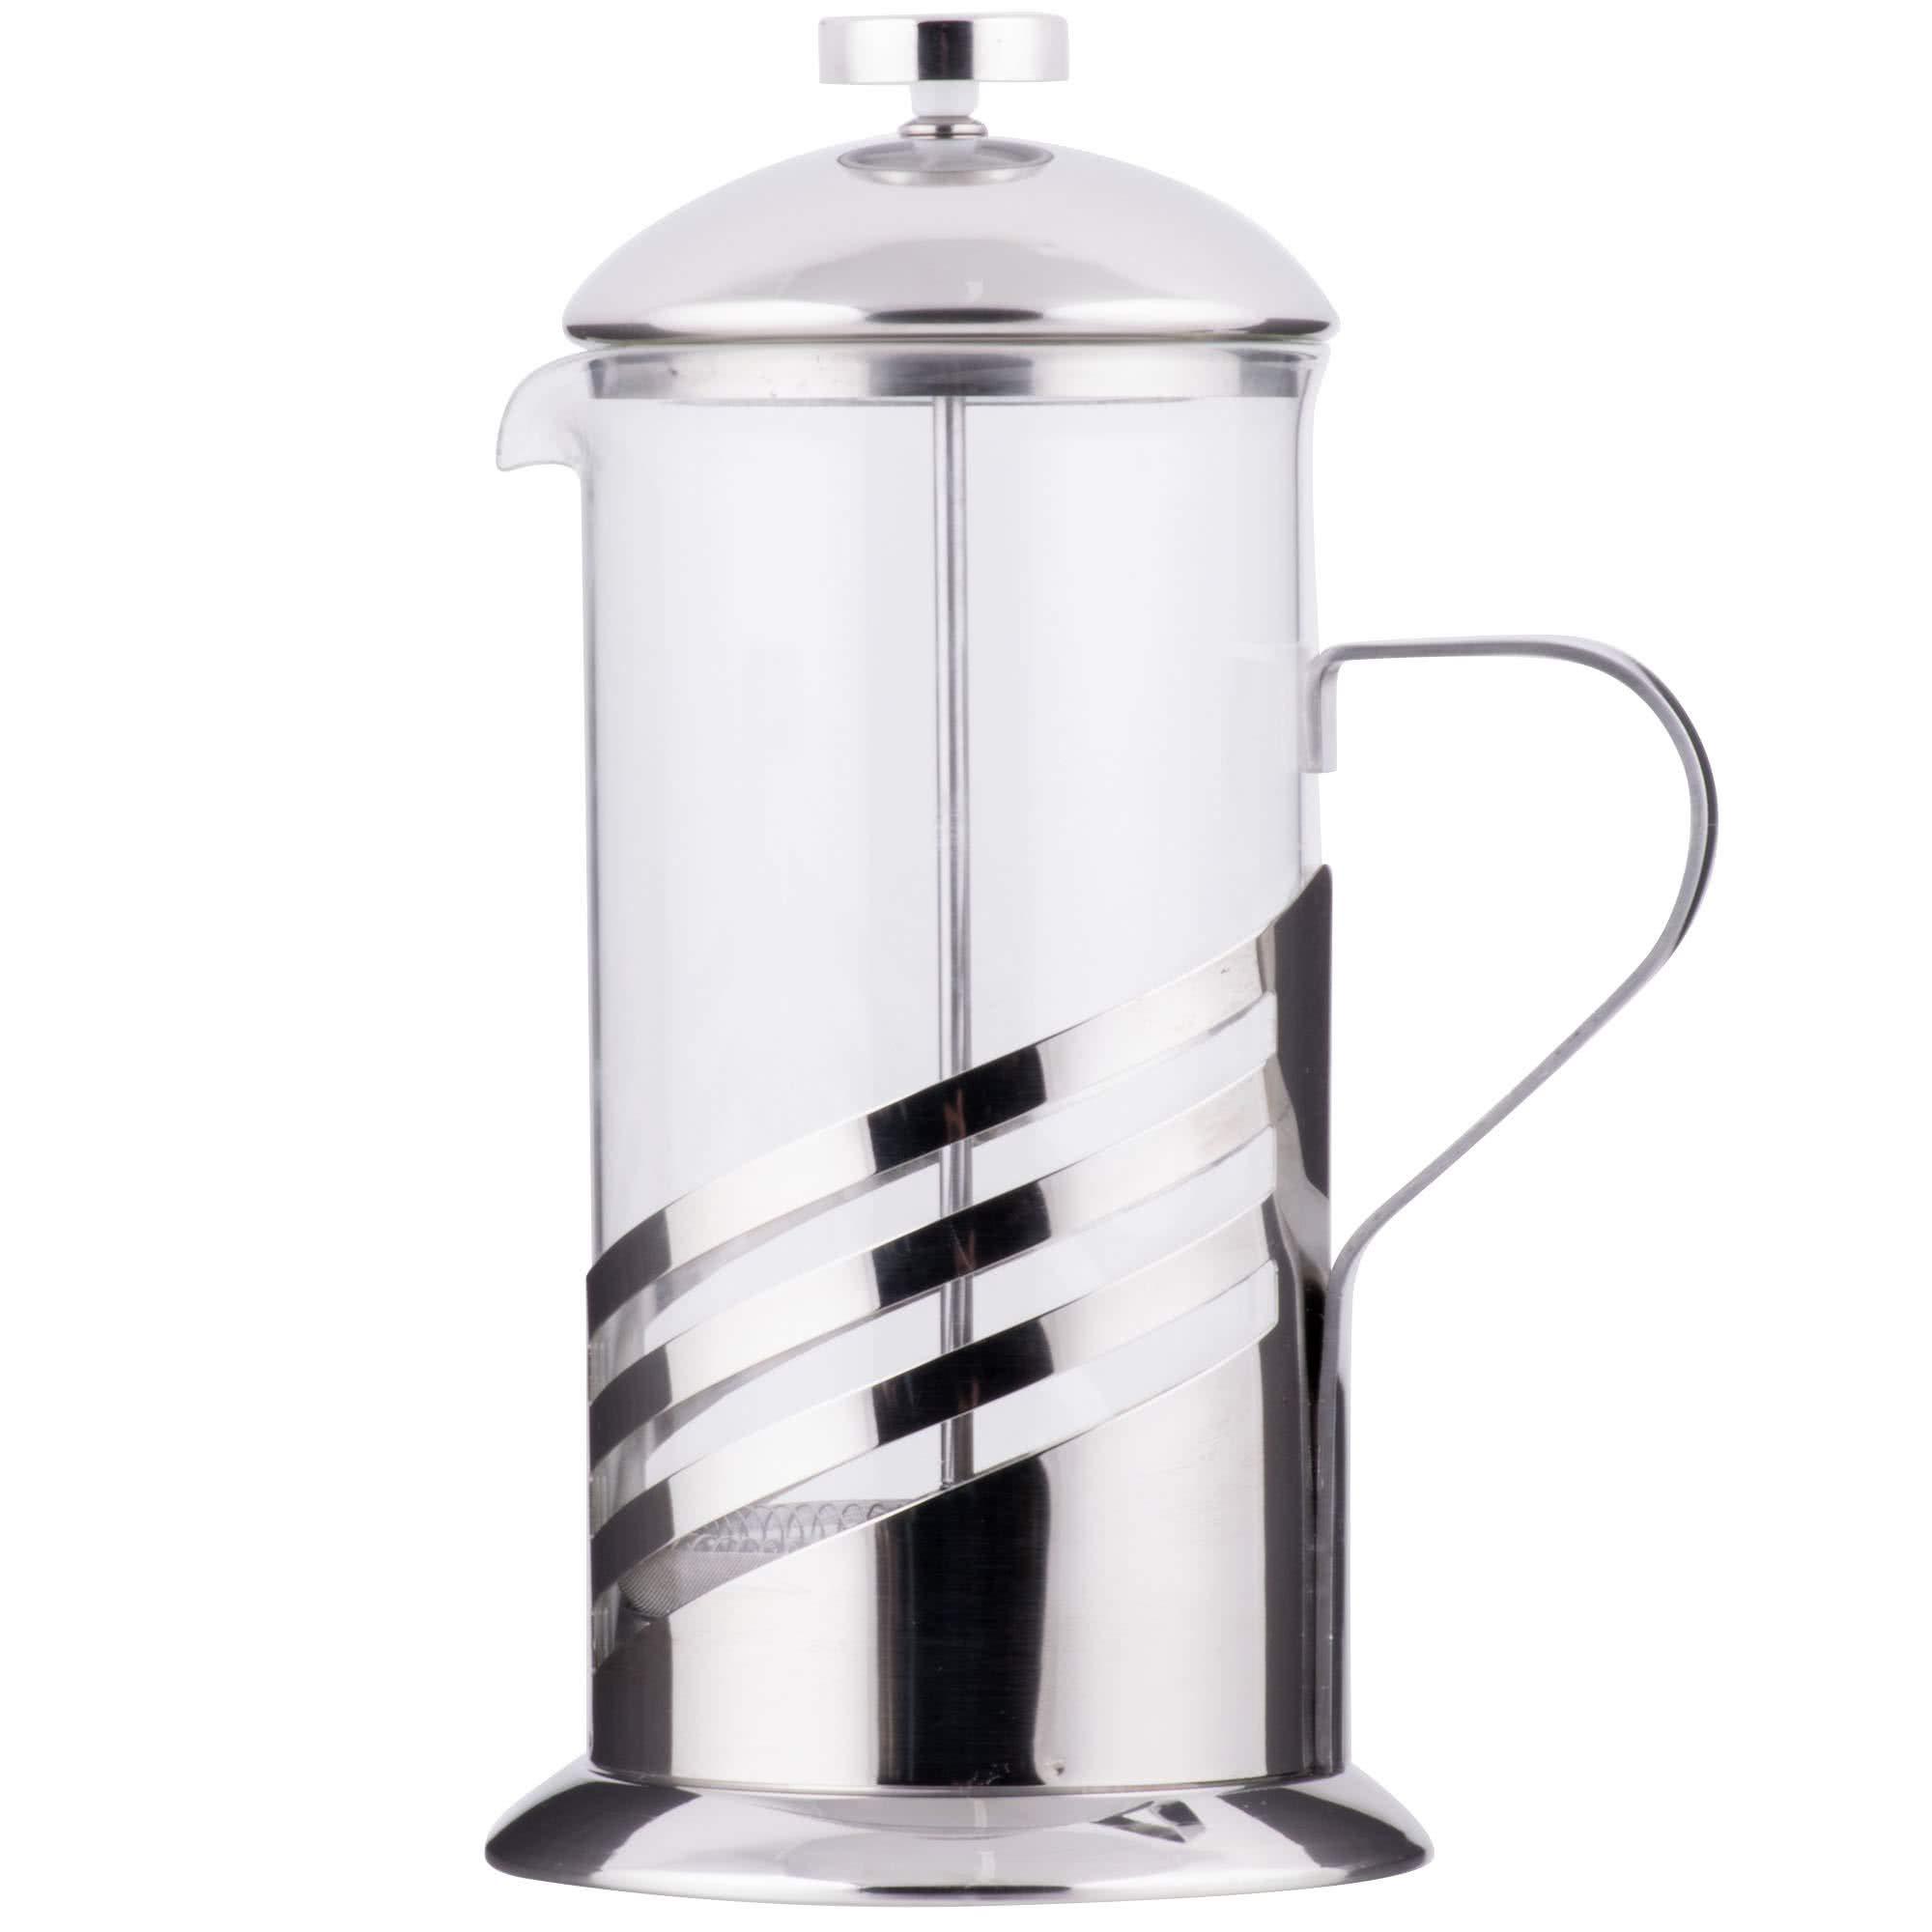 TableTop King 33 oz. Glass/Silver French Coffee Press